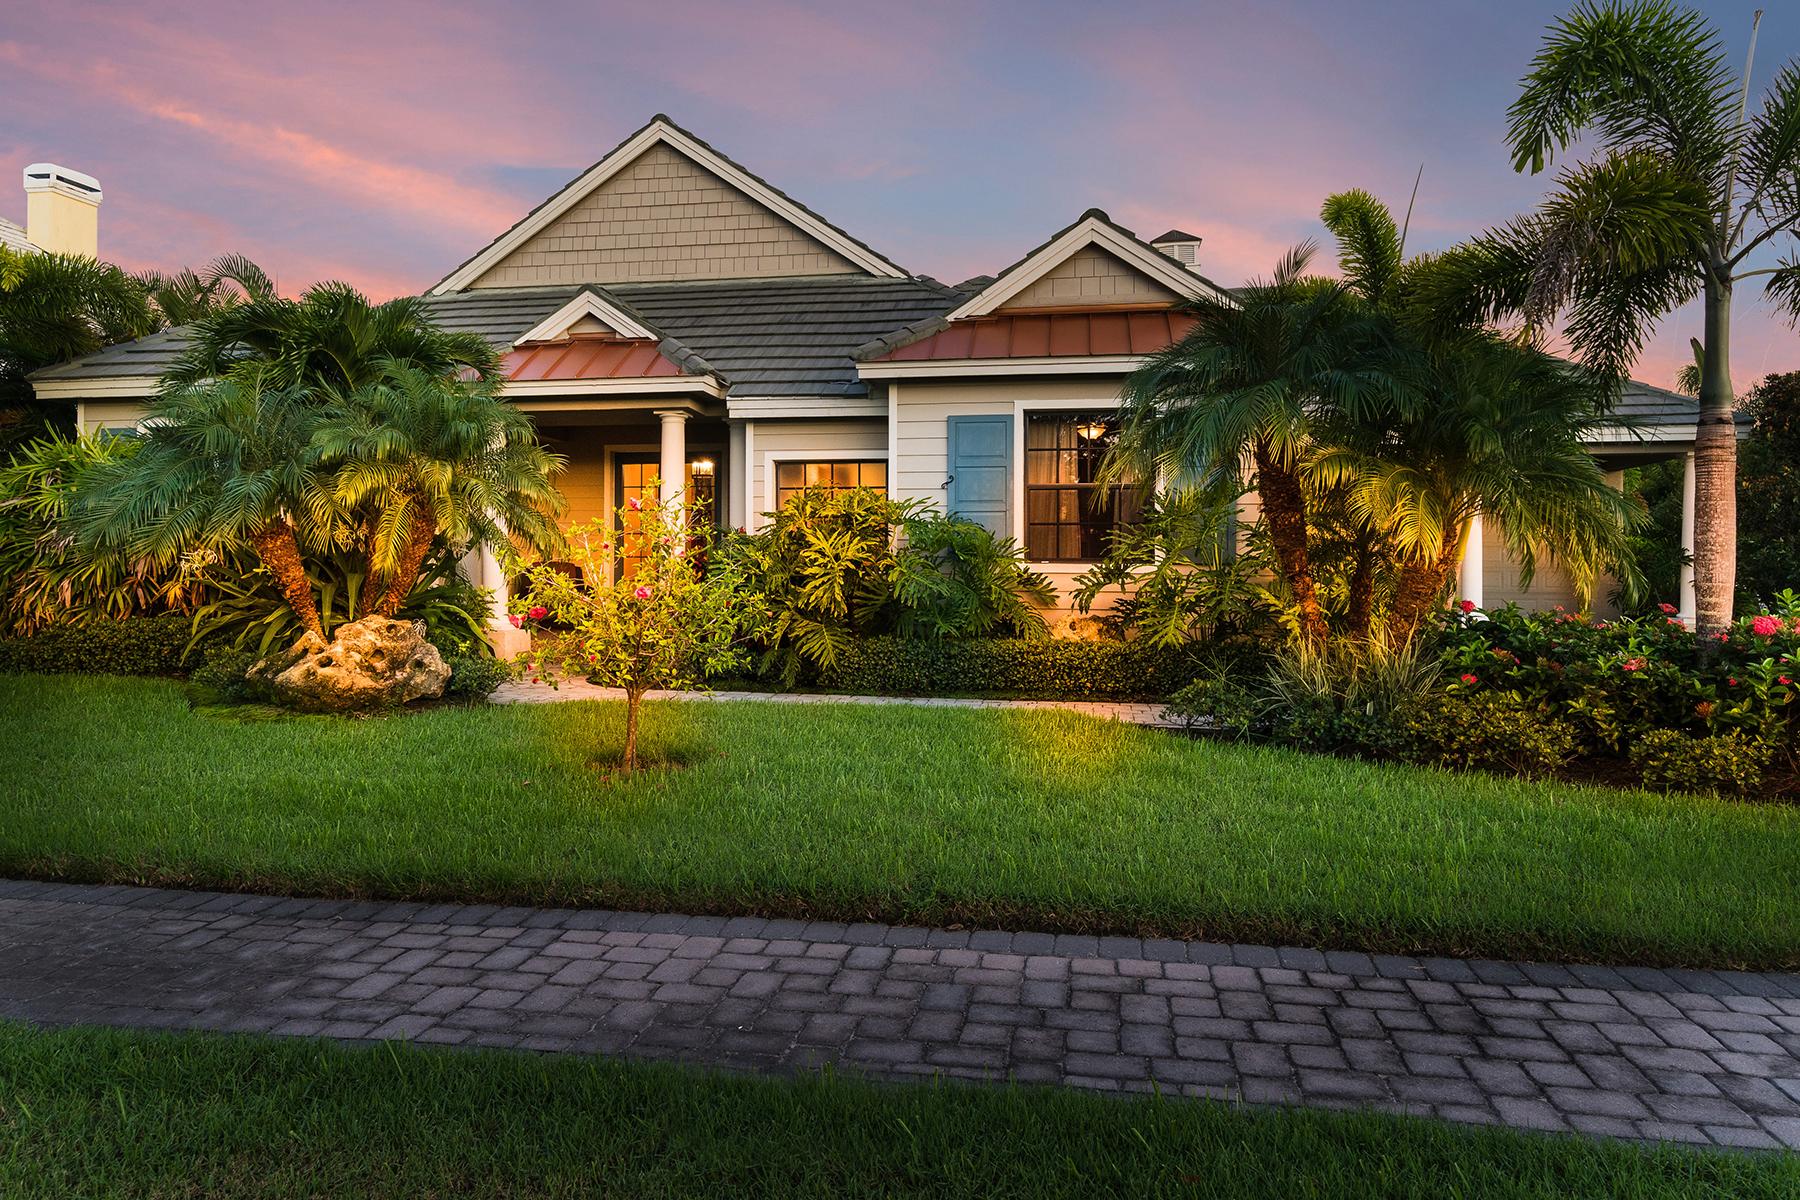 獨棟家庭住宅 為 出售 在 HARBOUR WALK AT THE INLETS 537 Fore Dr Bradenton, 佛羅里達州, 34208 美國